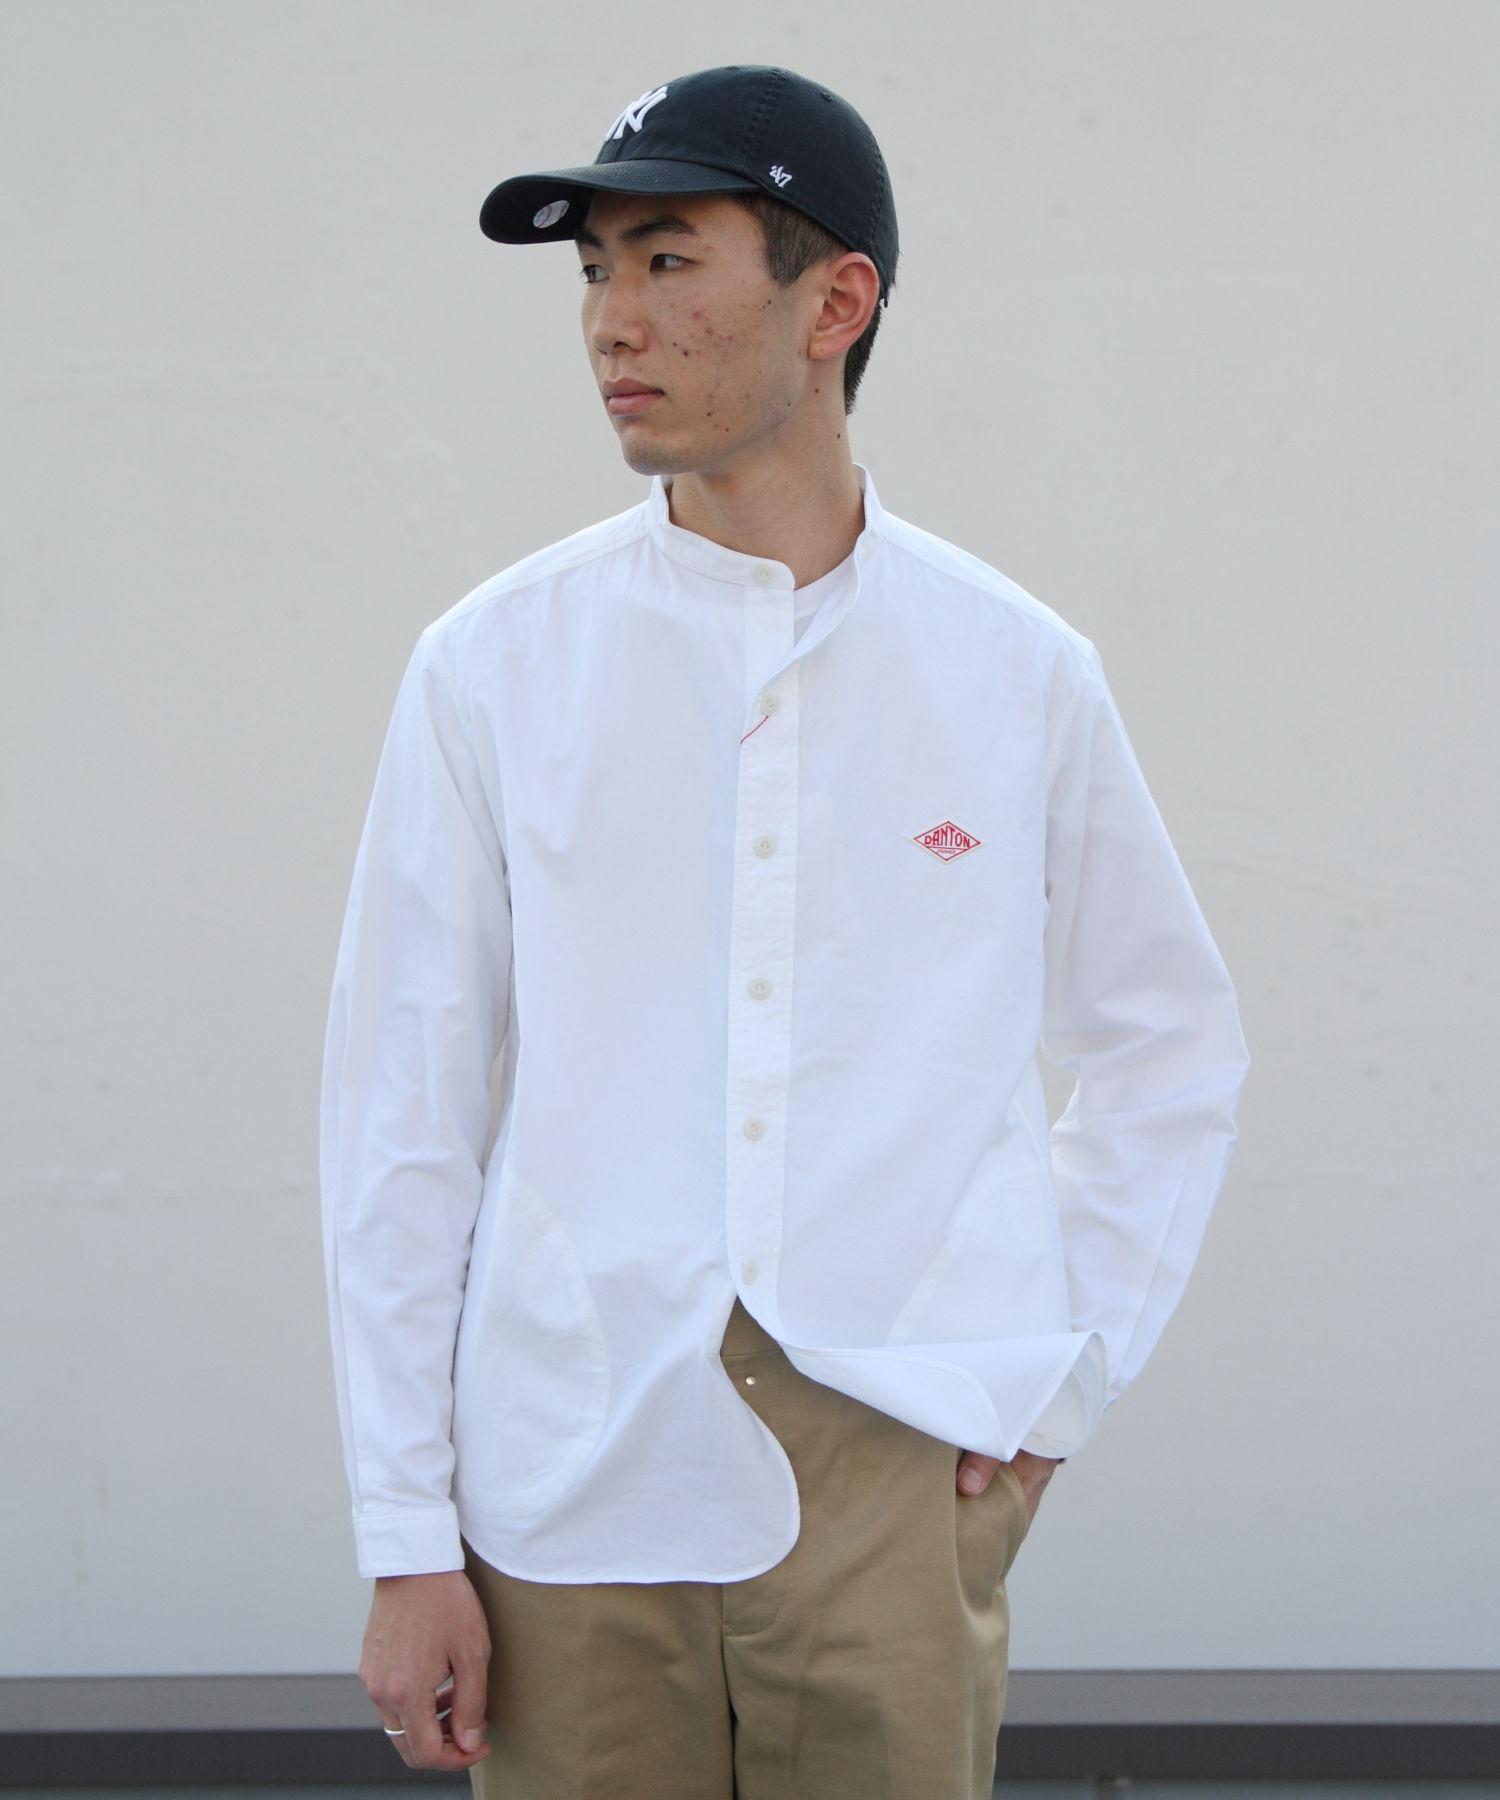 DANTON/ダントン オックススタンドシャツ OX STAND SHIRTS(メンズ)#JD3607YOX